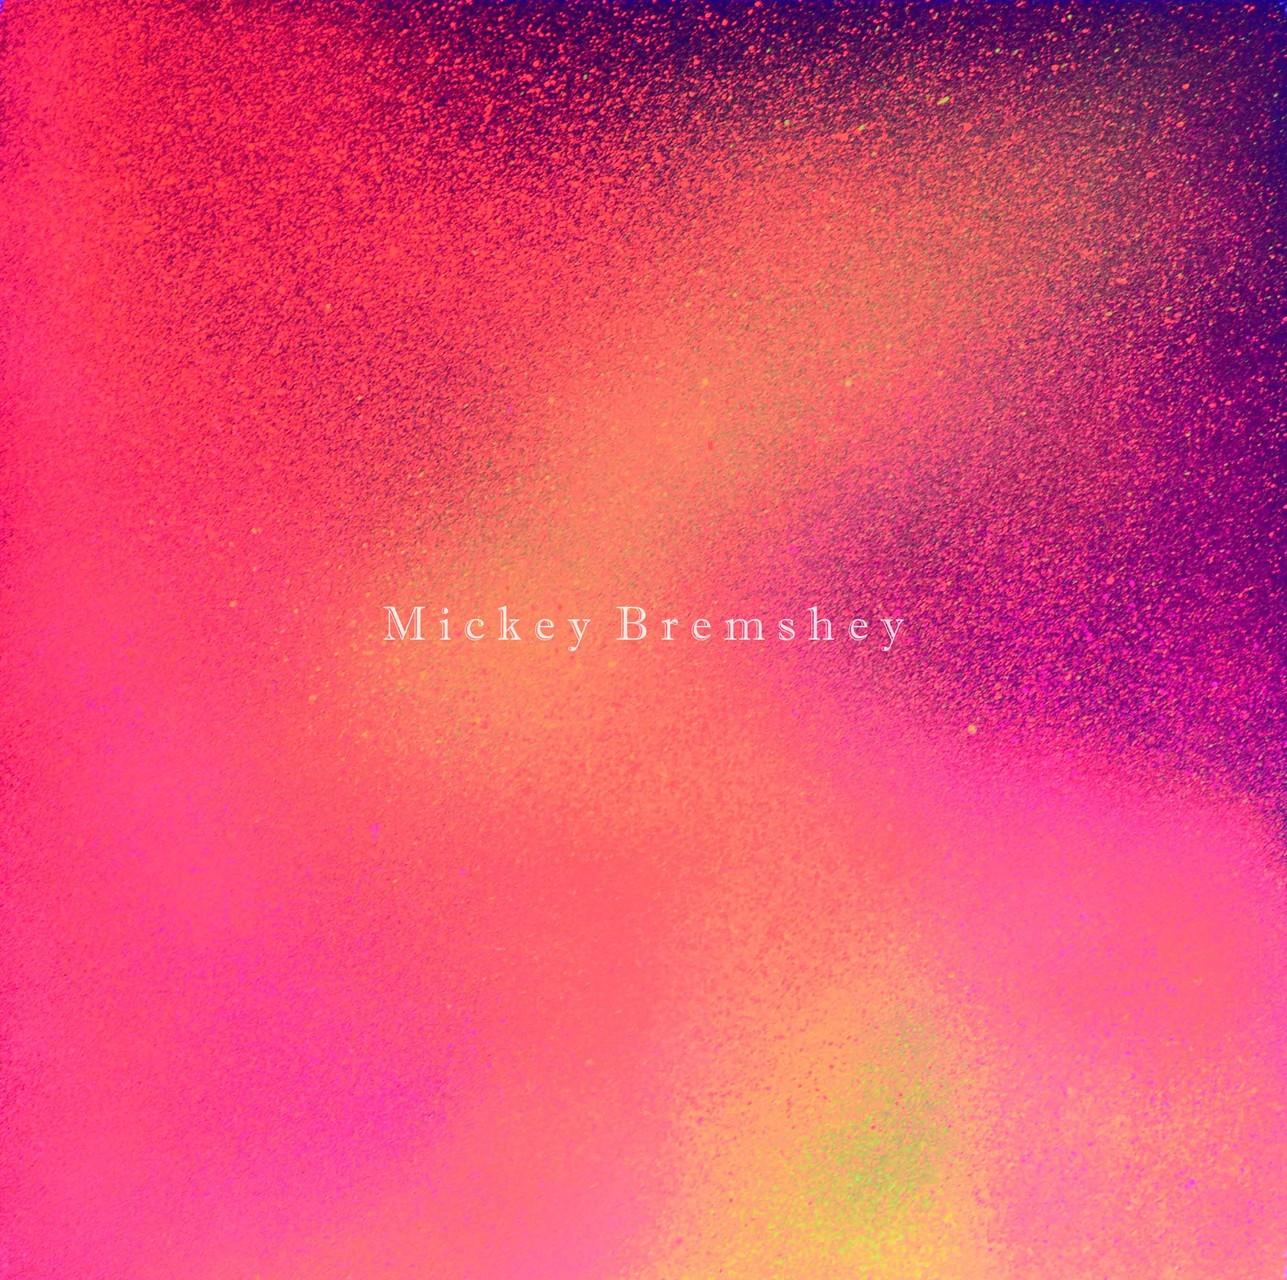 bremshey.illuminare.081275-002